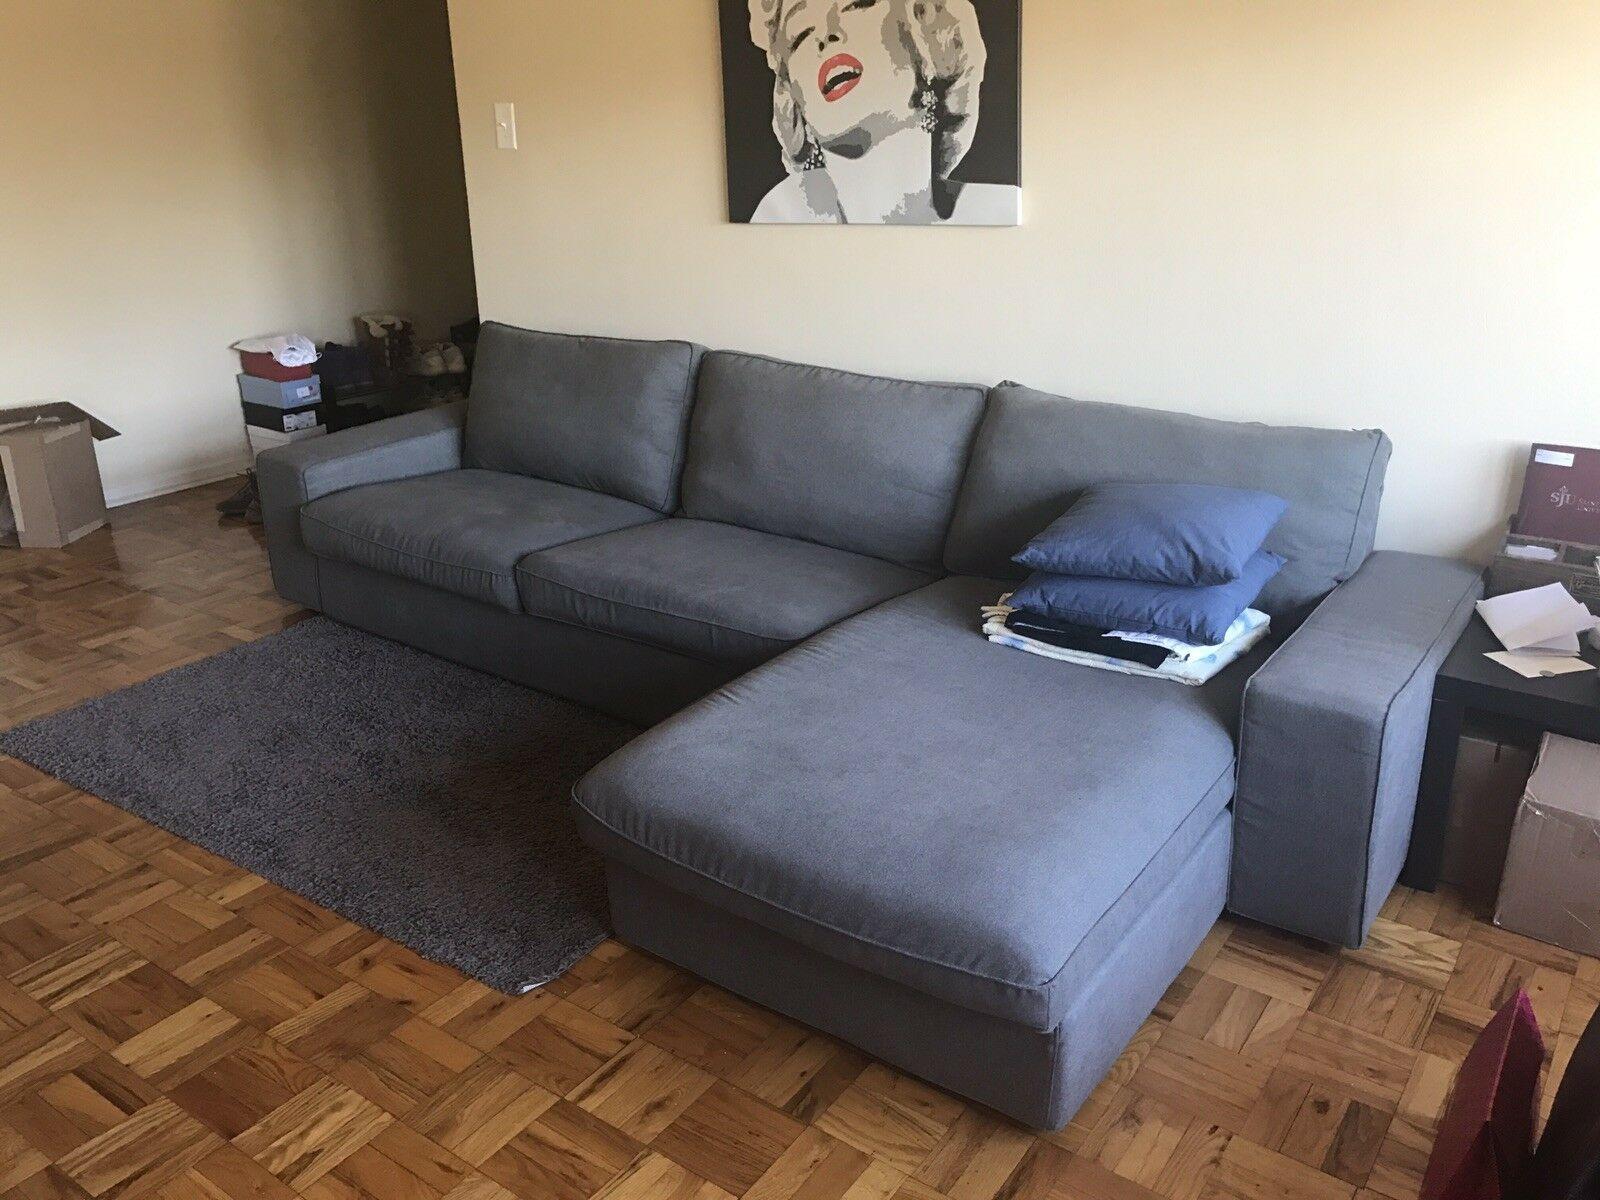 Ikea Sofa Set Living Room Almost Brand